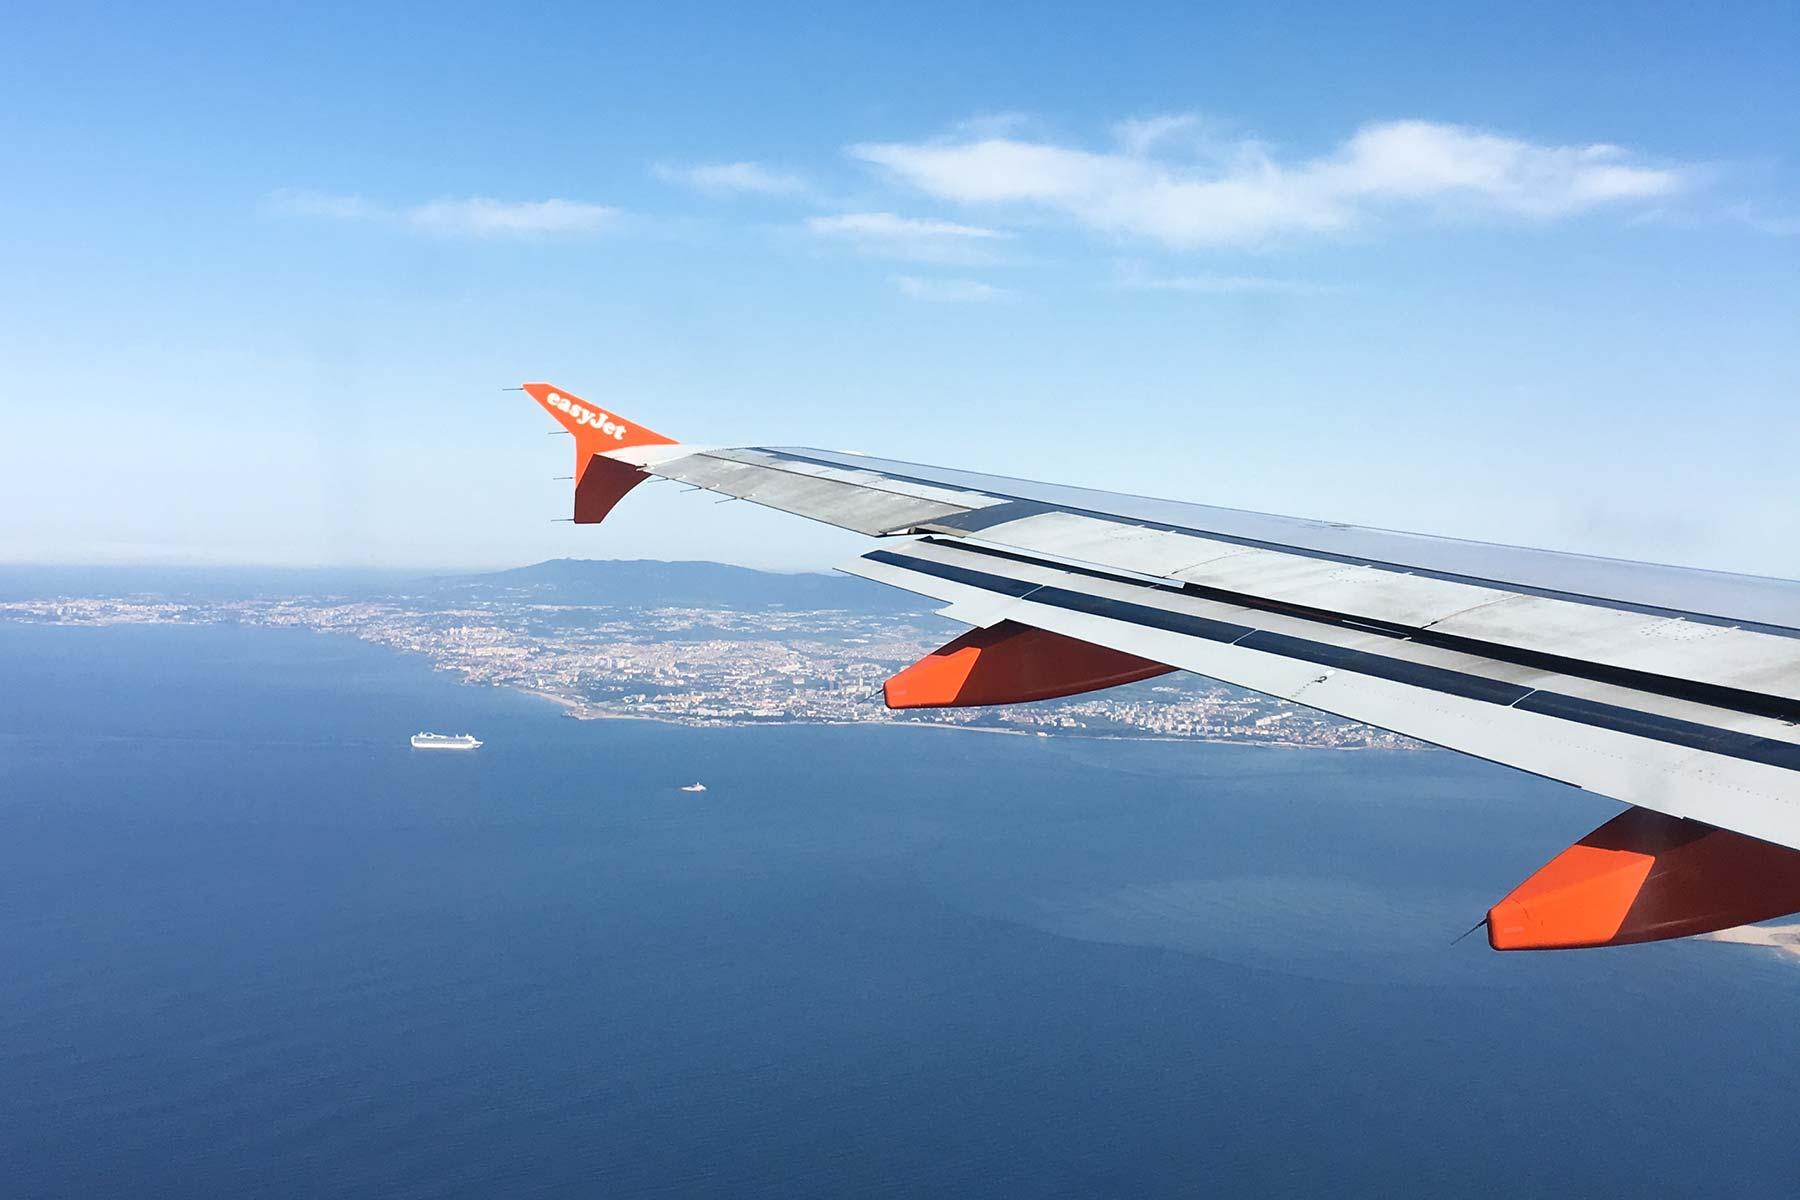 Easyjet Ladeanflug auf Lissabon, Portugal